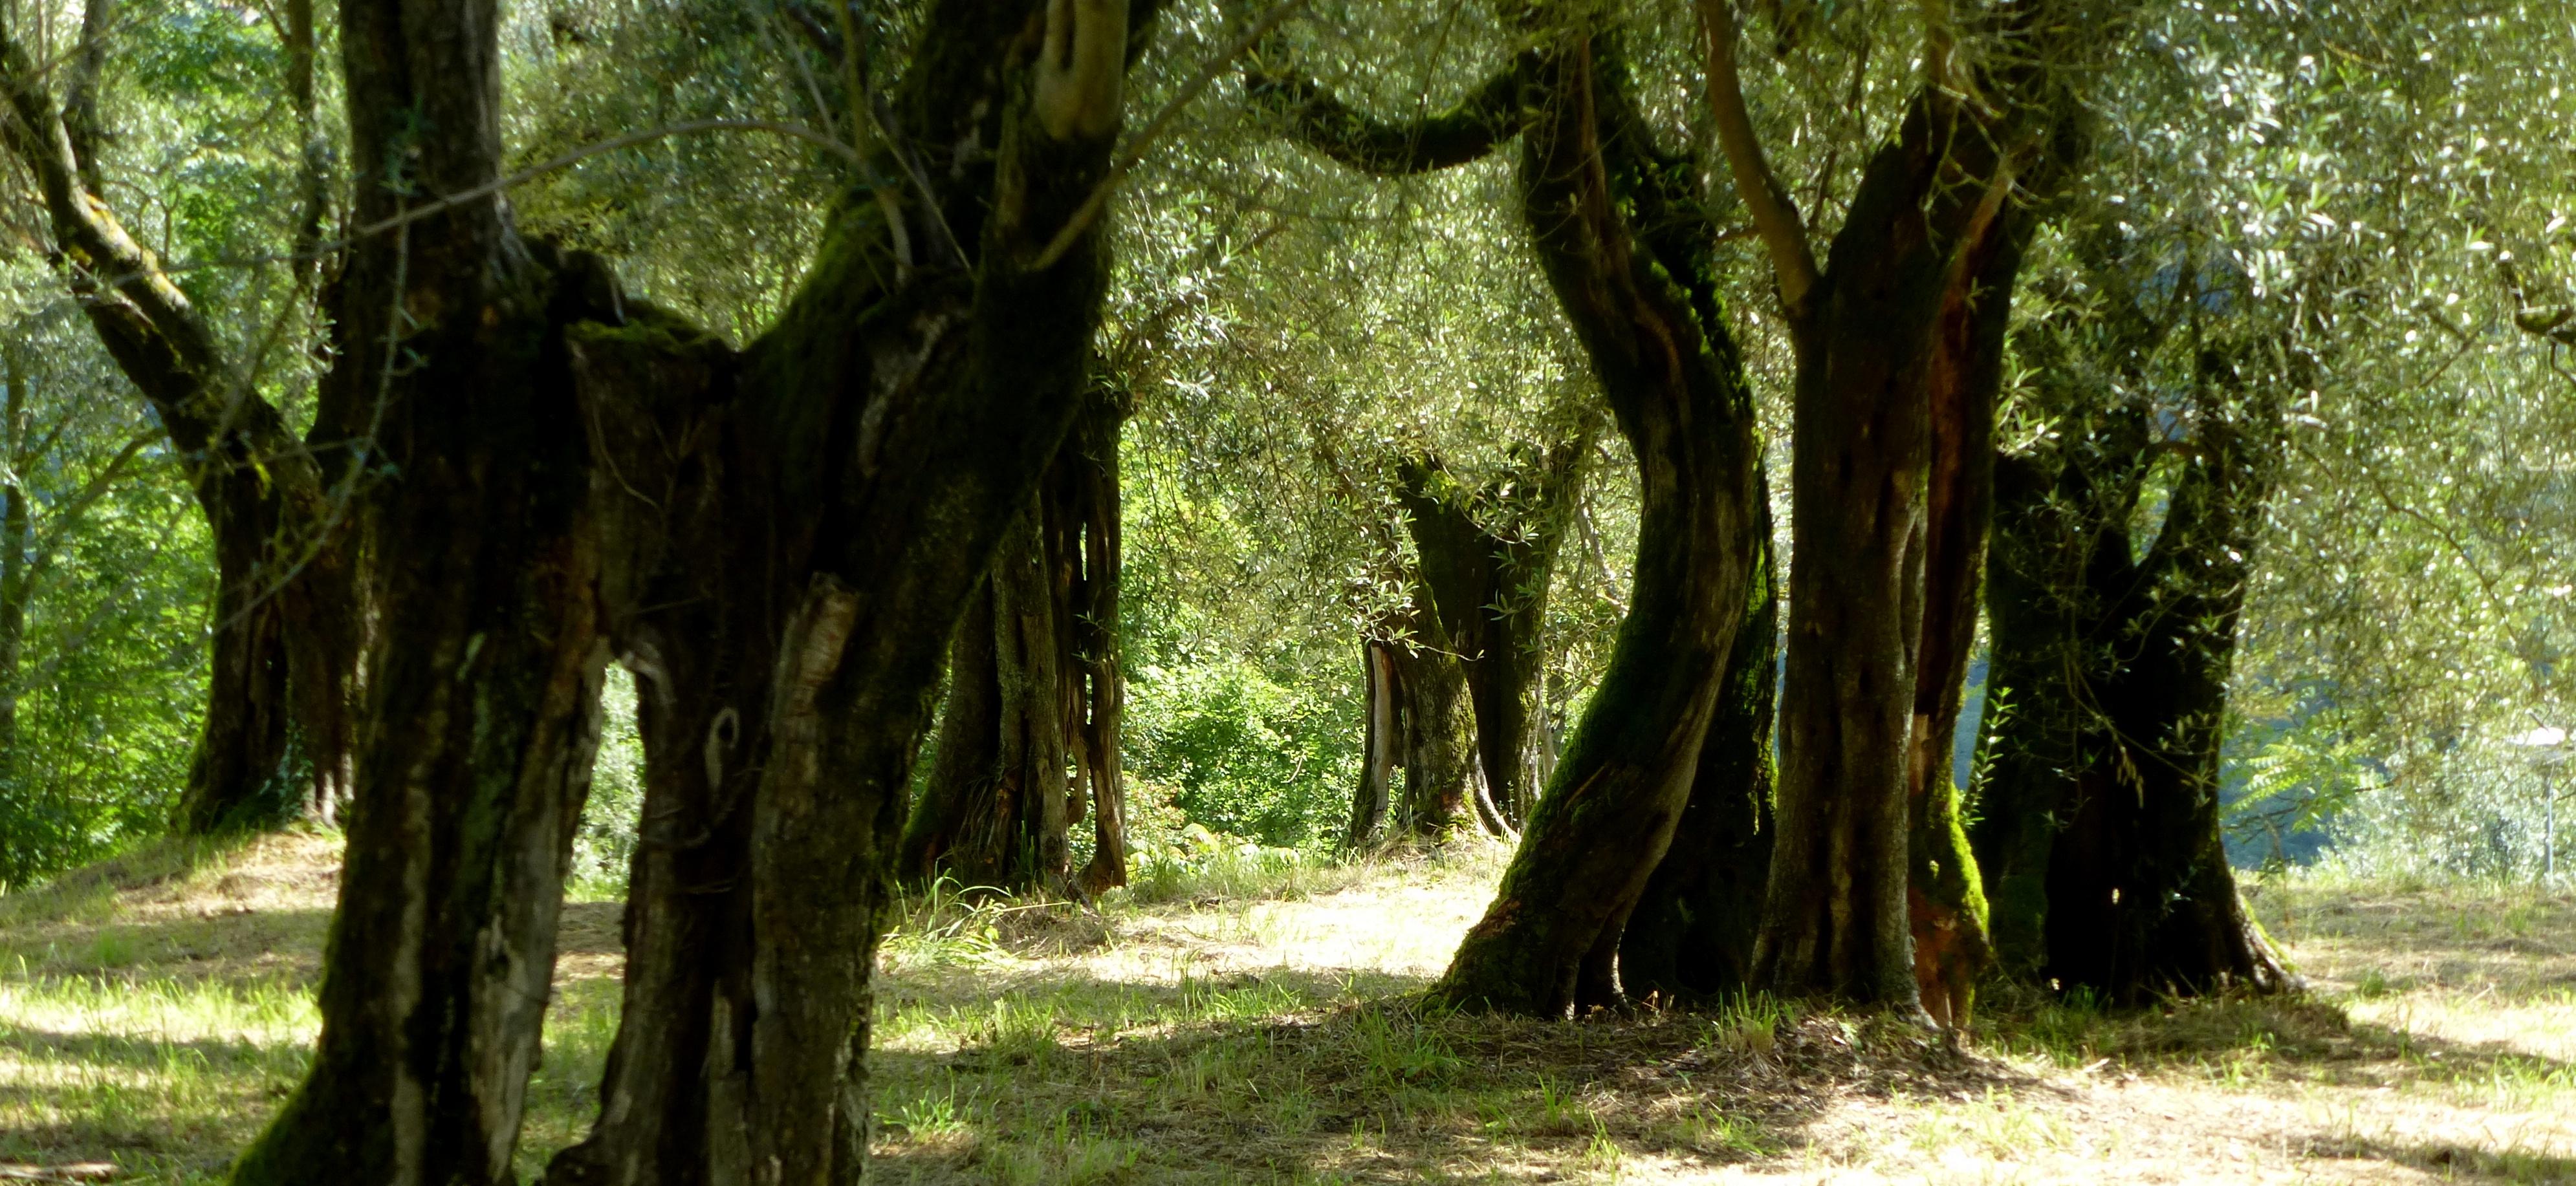 mature olive grove in Perugia